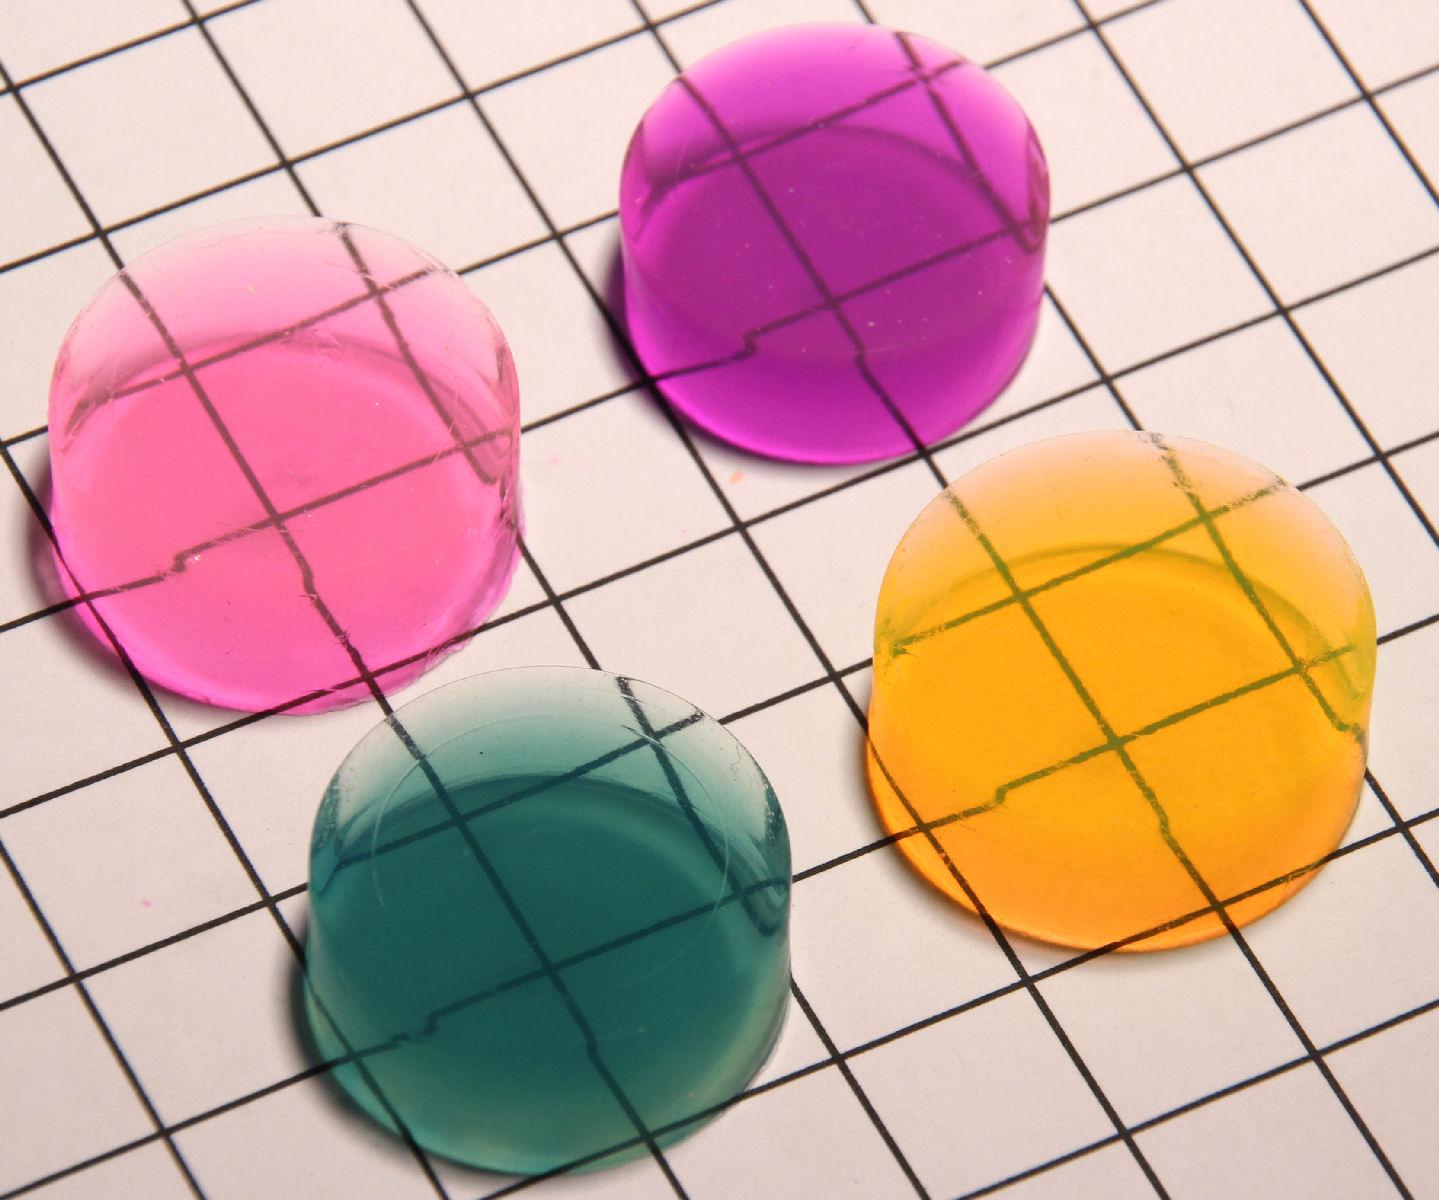 buyaerogel com colored aerogel discs